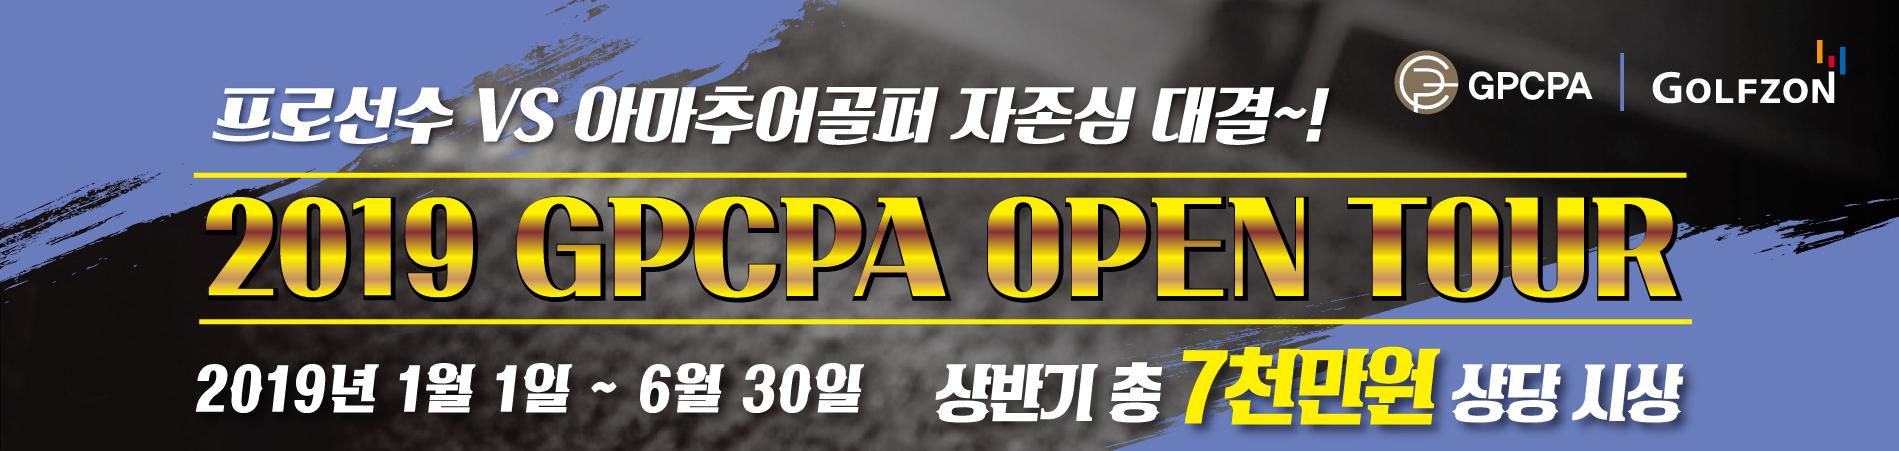 2019 GPCPA 오픈투어